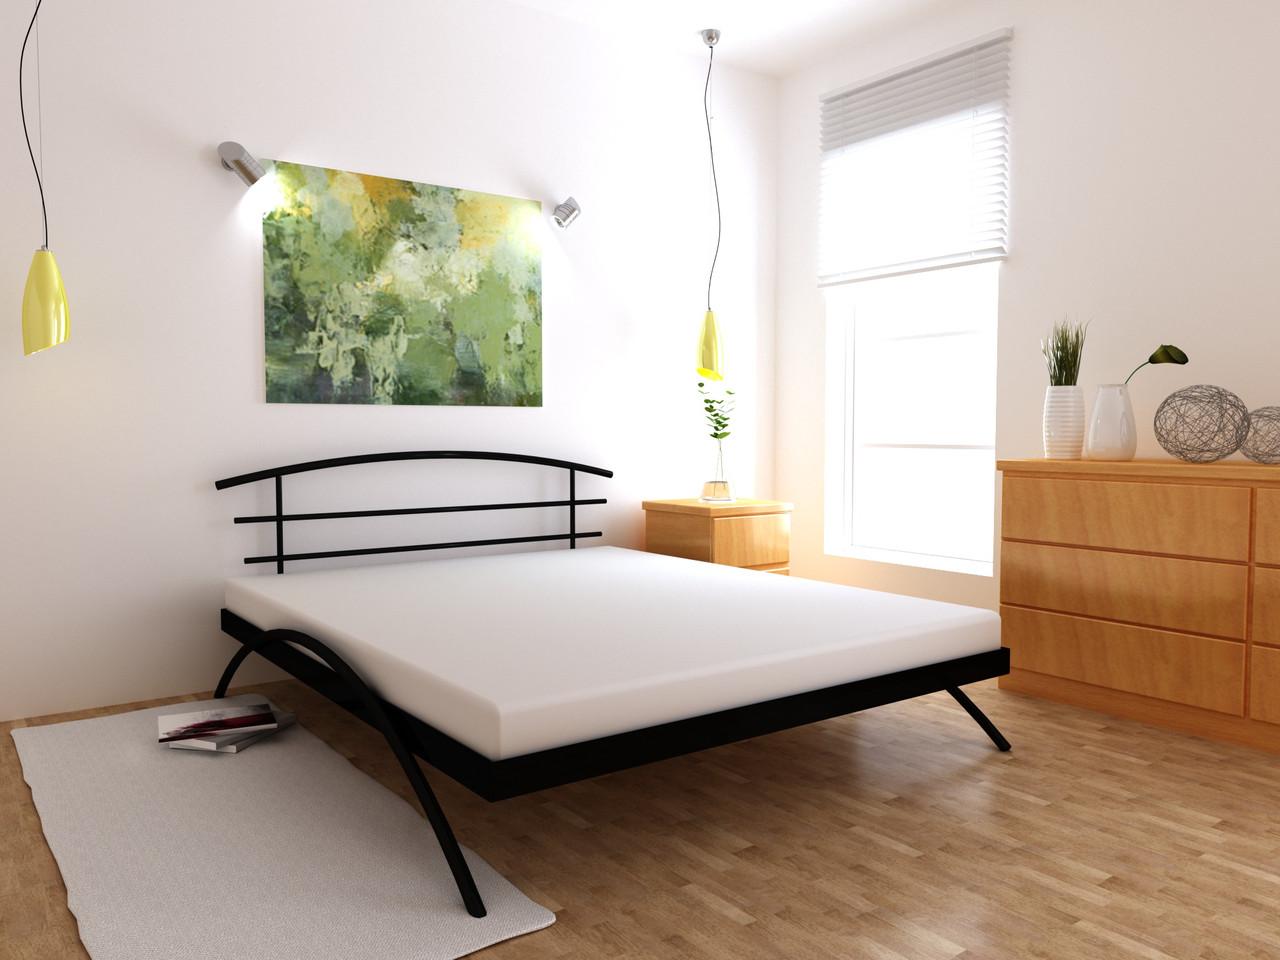 Металеве ліжко Сакура односпальні 80х190 см, ортопедична